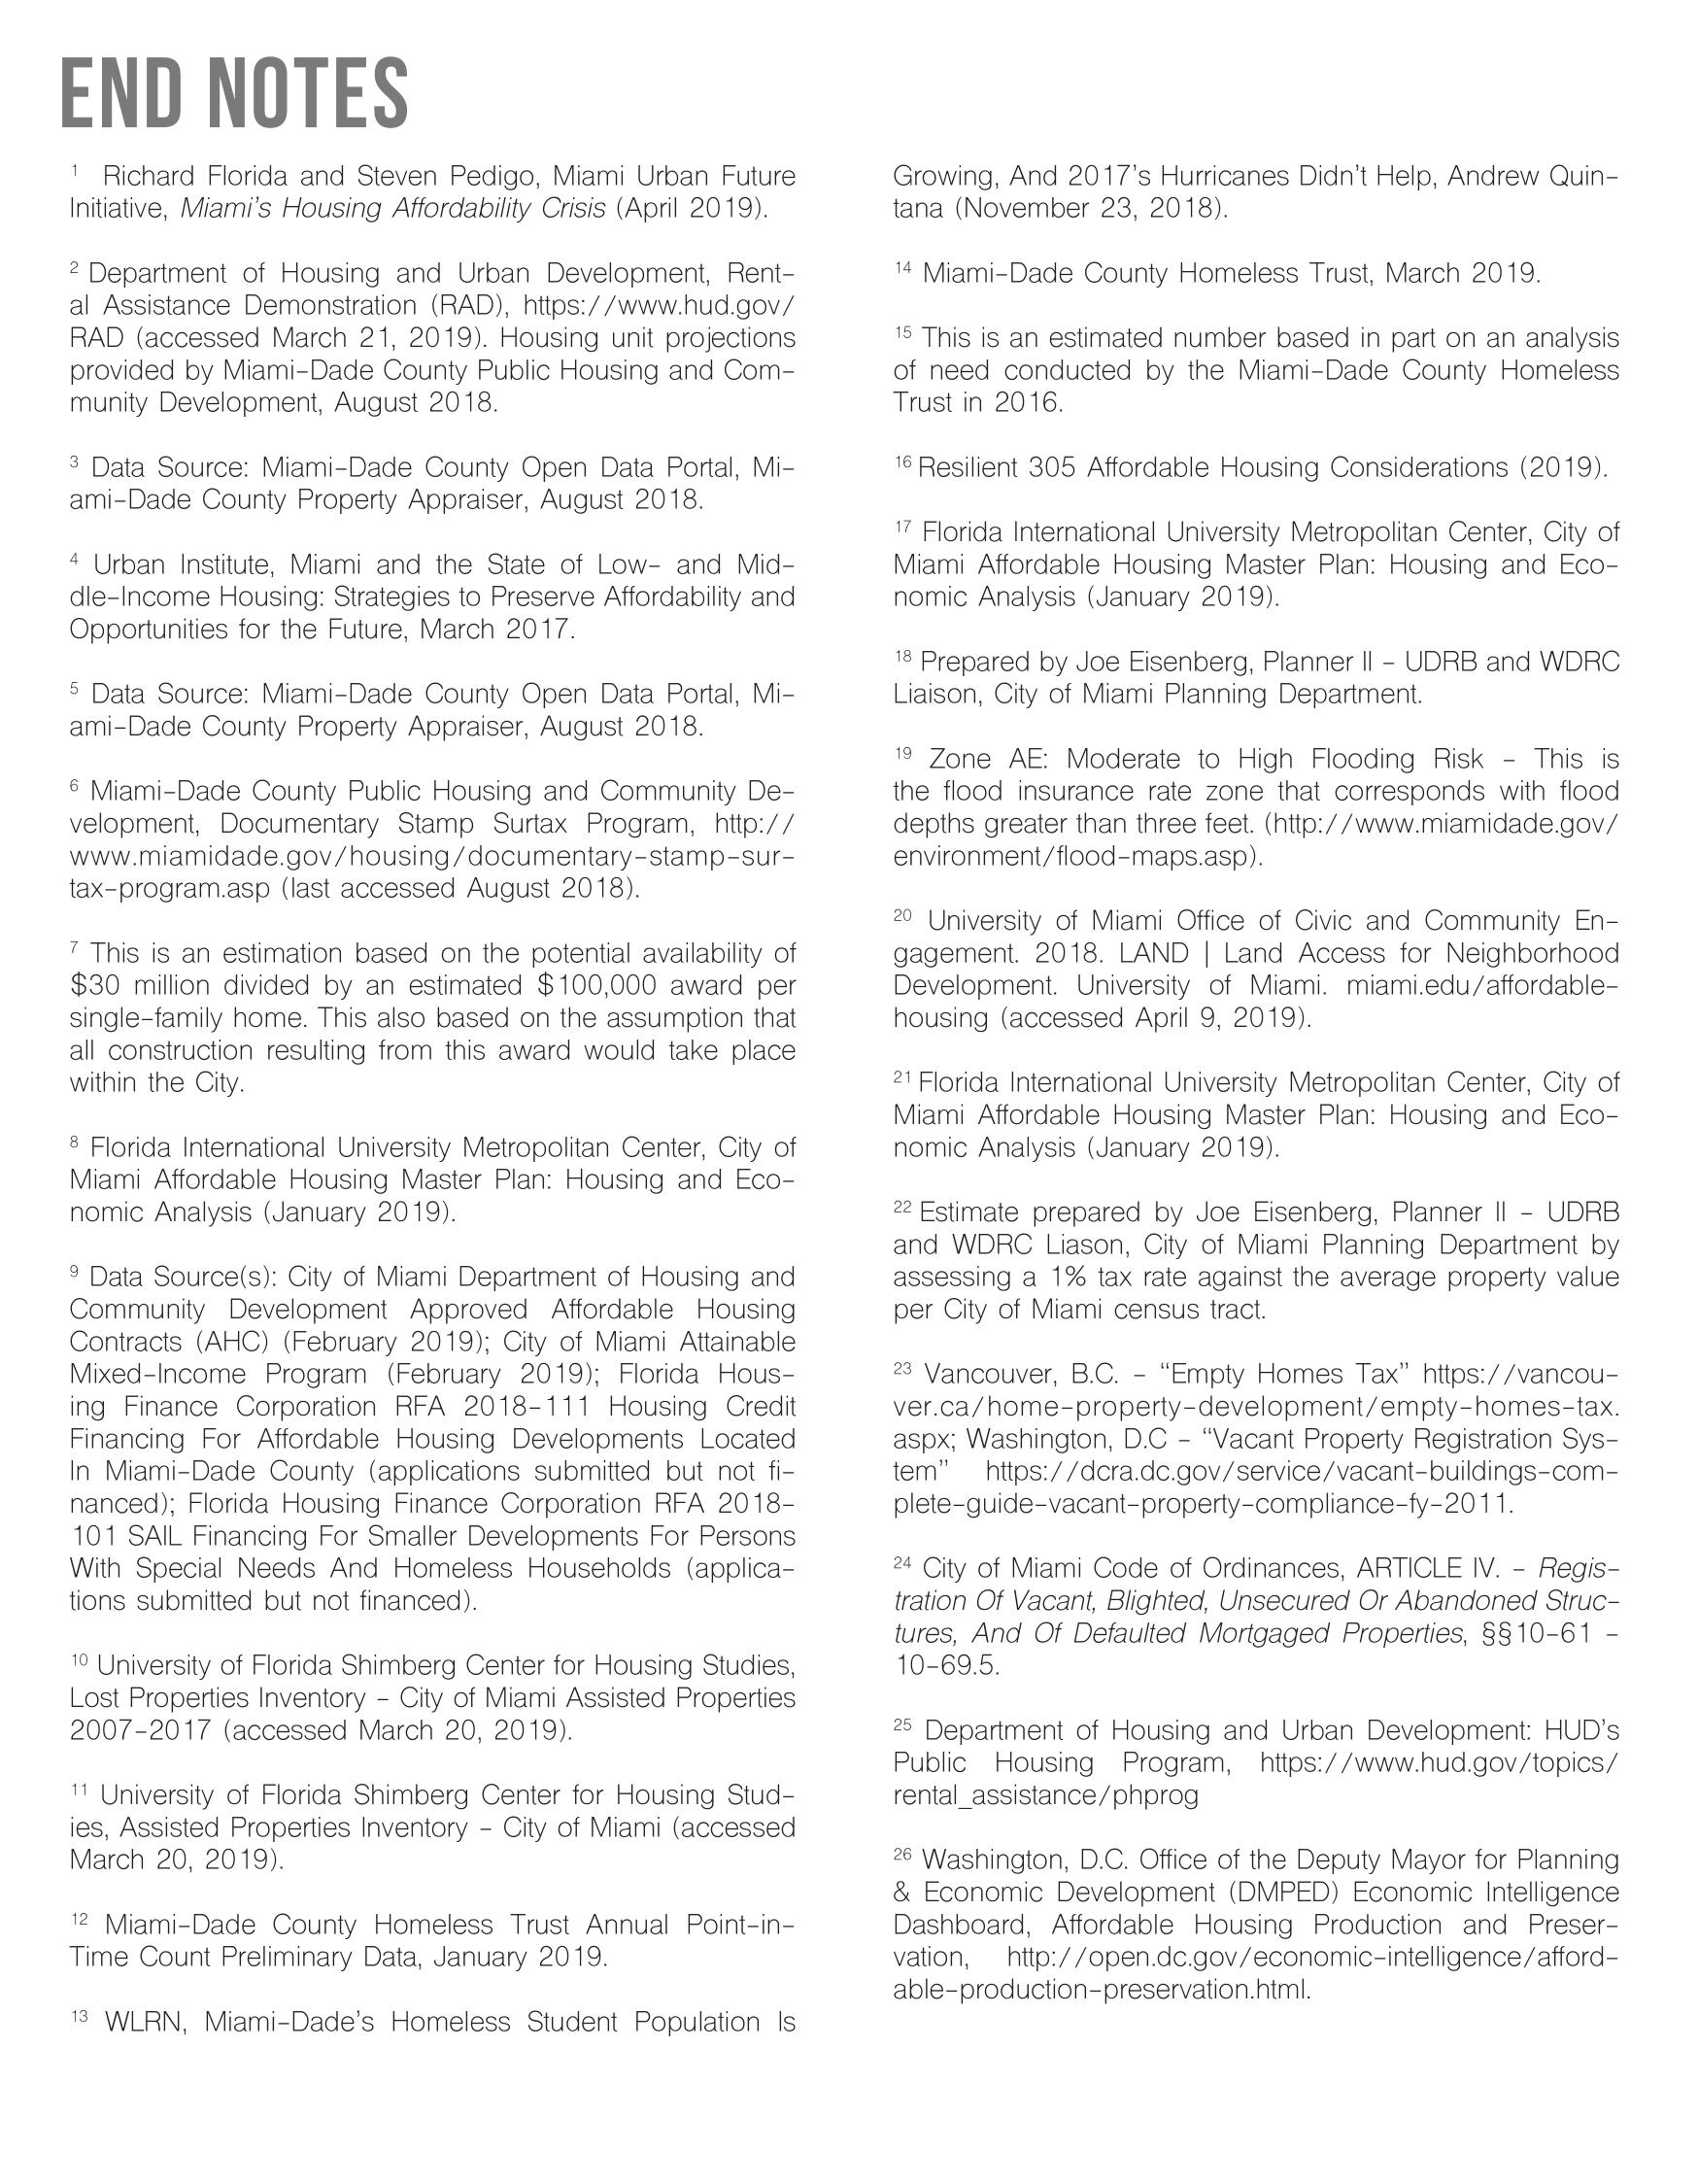 CC - Report FINAL DRAFT (5.9.2019)-12.png